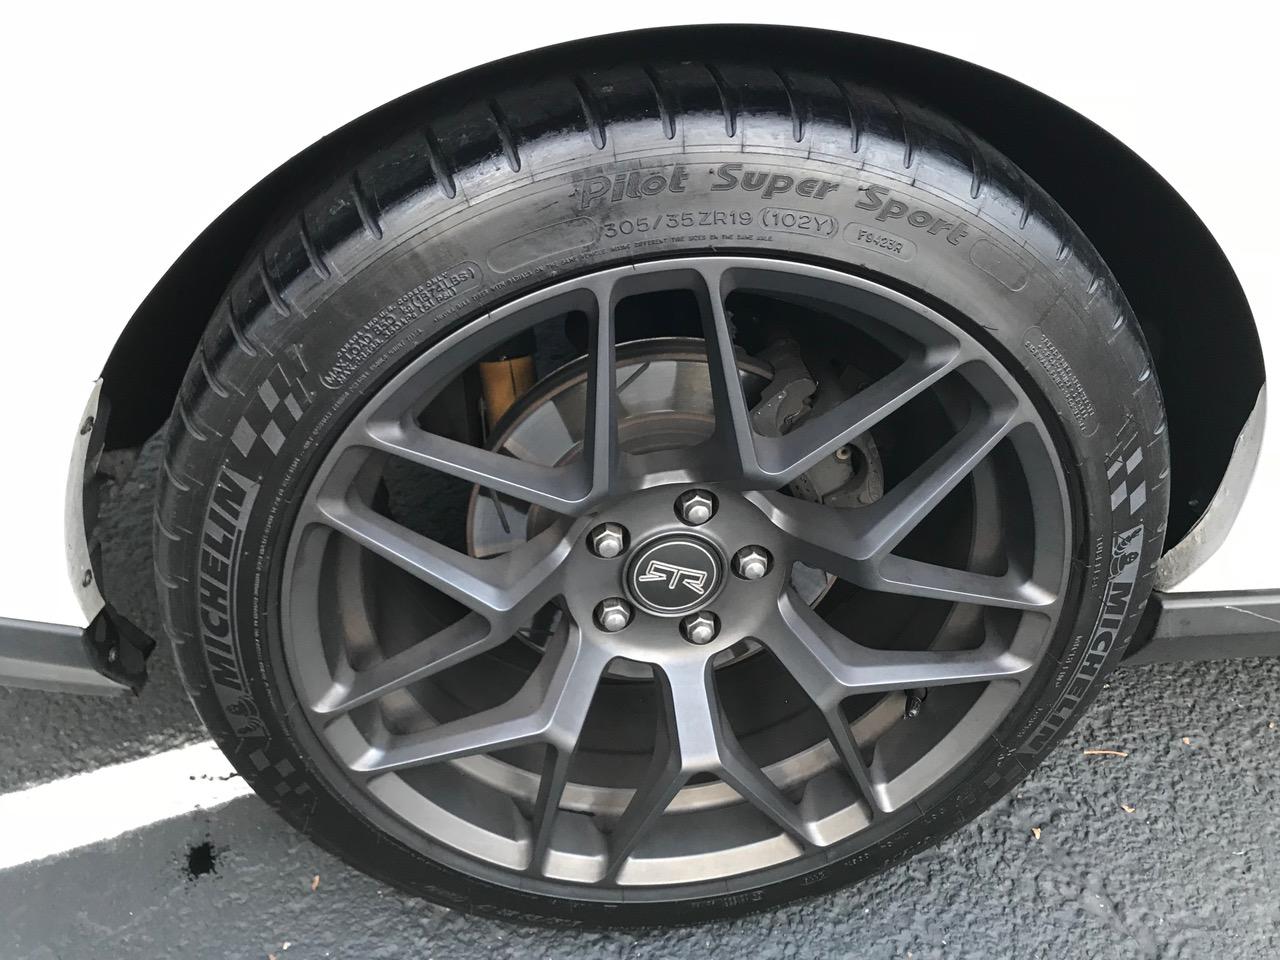 Z-Car Blog » 2012 Mustang GT Premium w/Vortech Supercharger